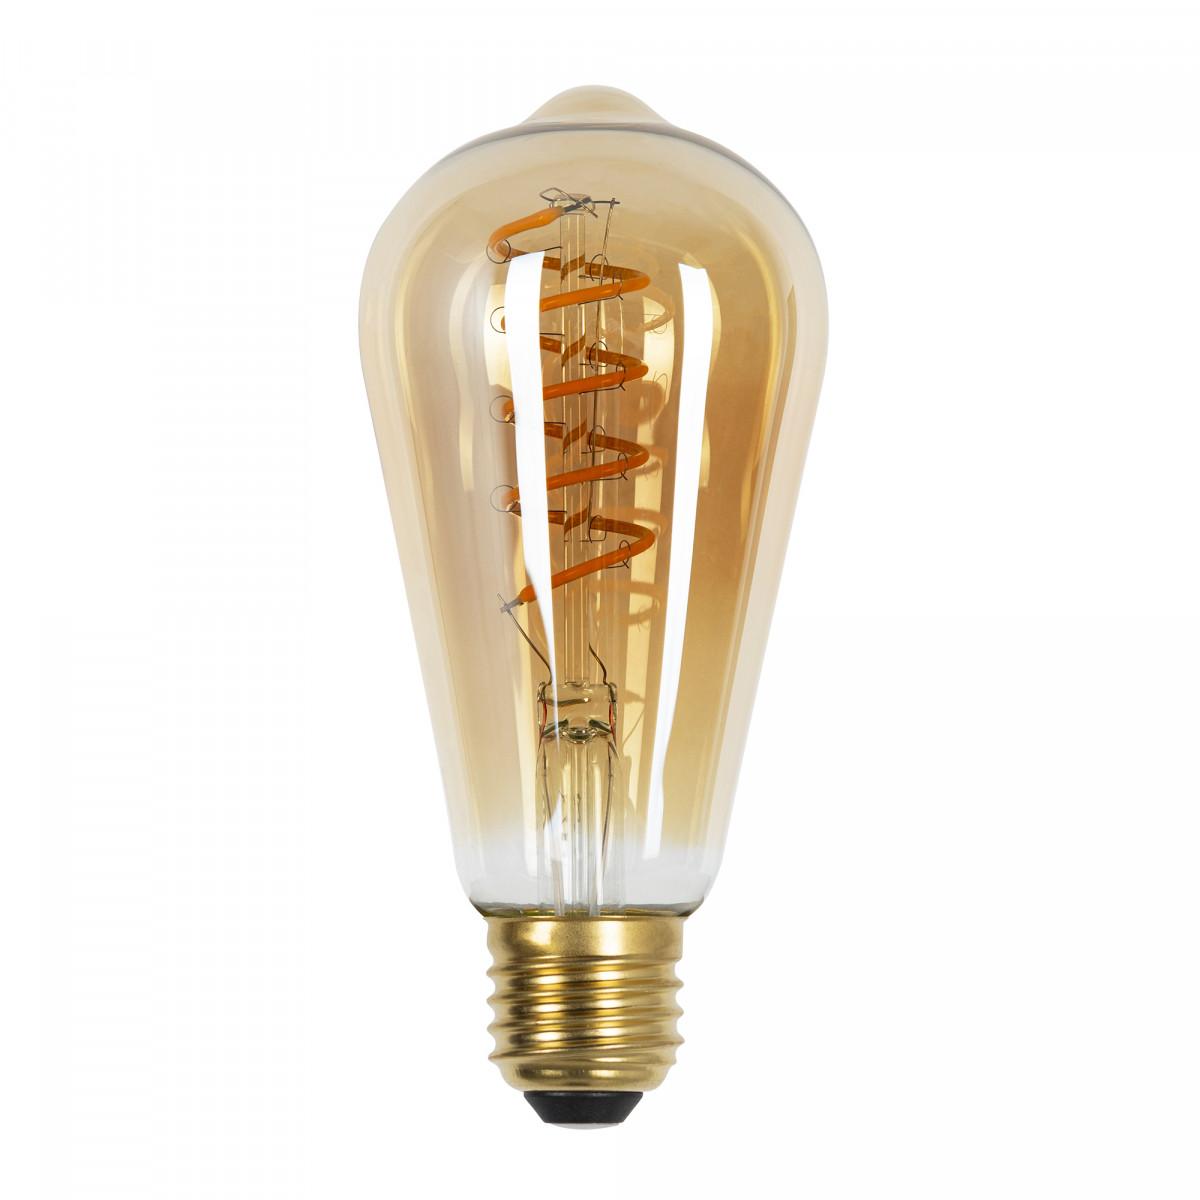 LED Rustic Spiral 4W